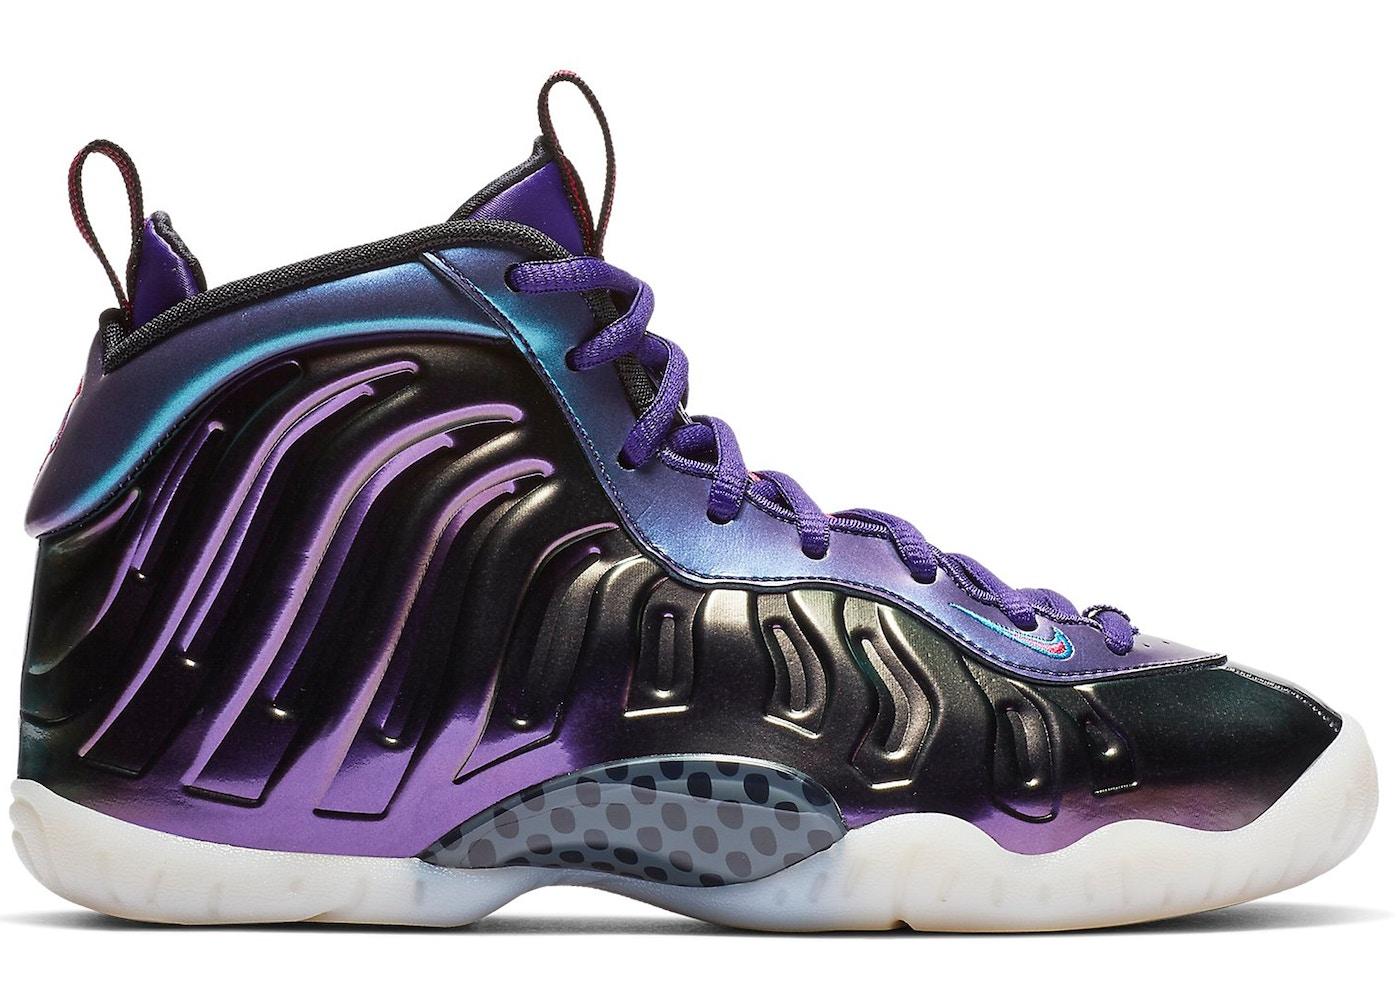 quality design 92009 71f4c Buy Nike Foamposite Shoes   Deadstock Sneakers